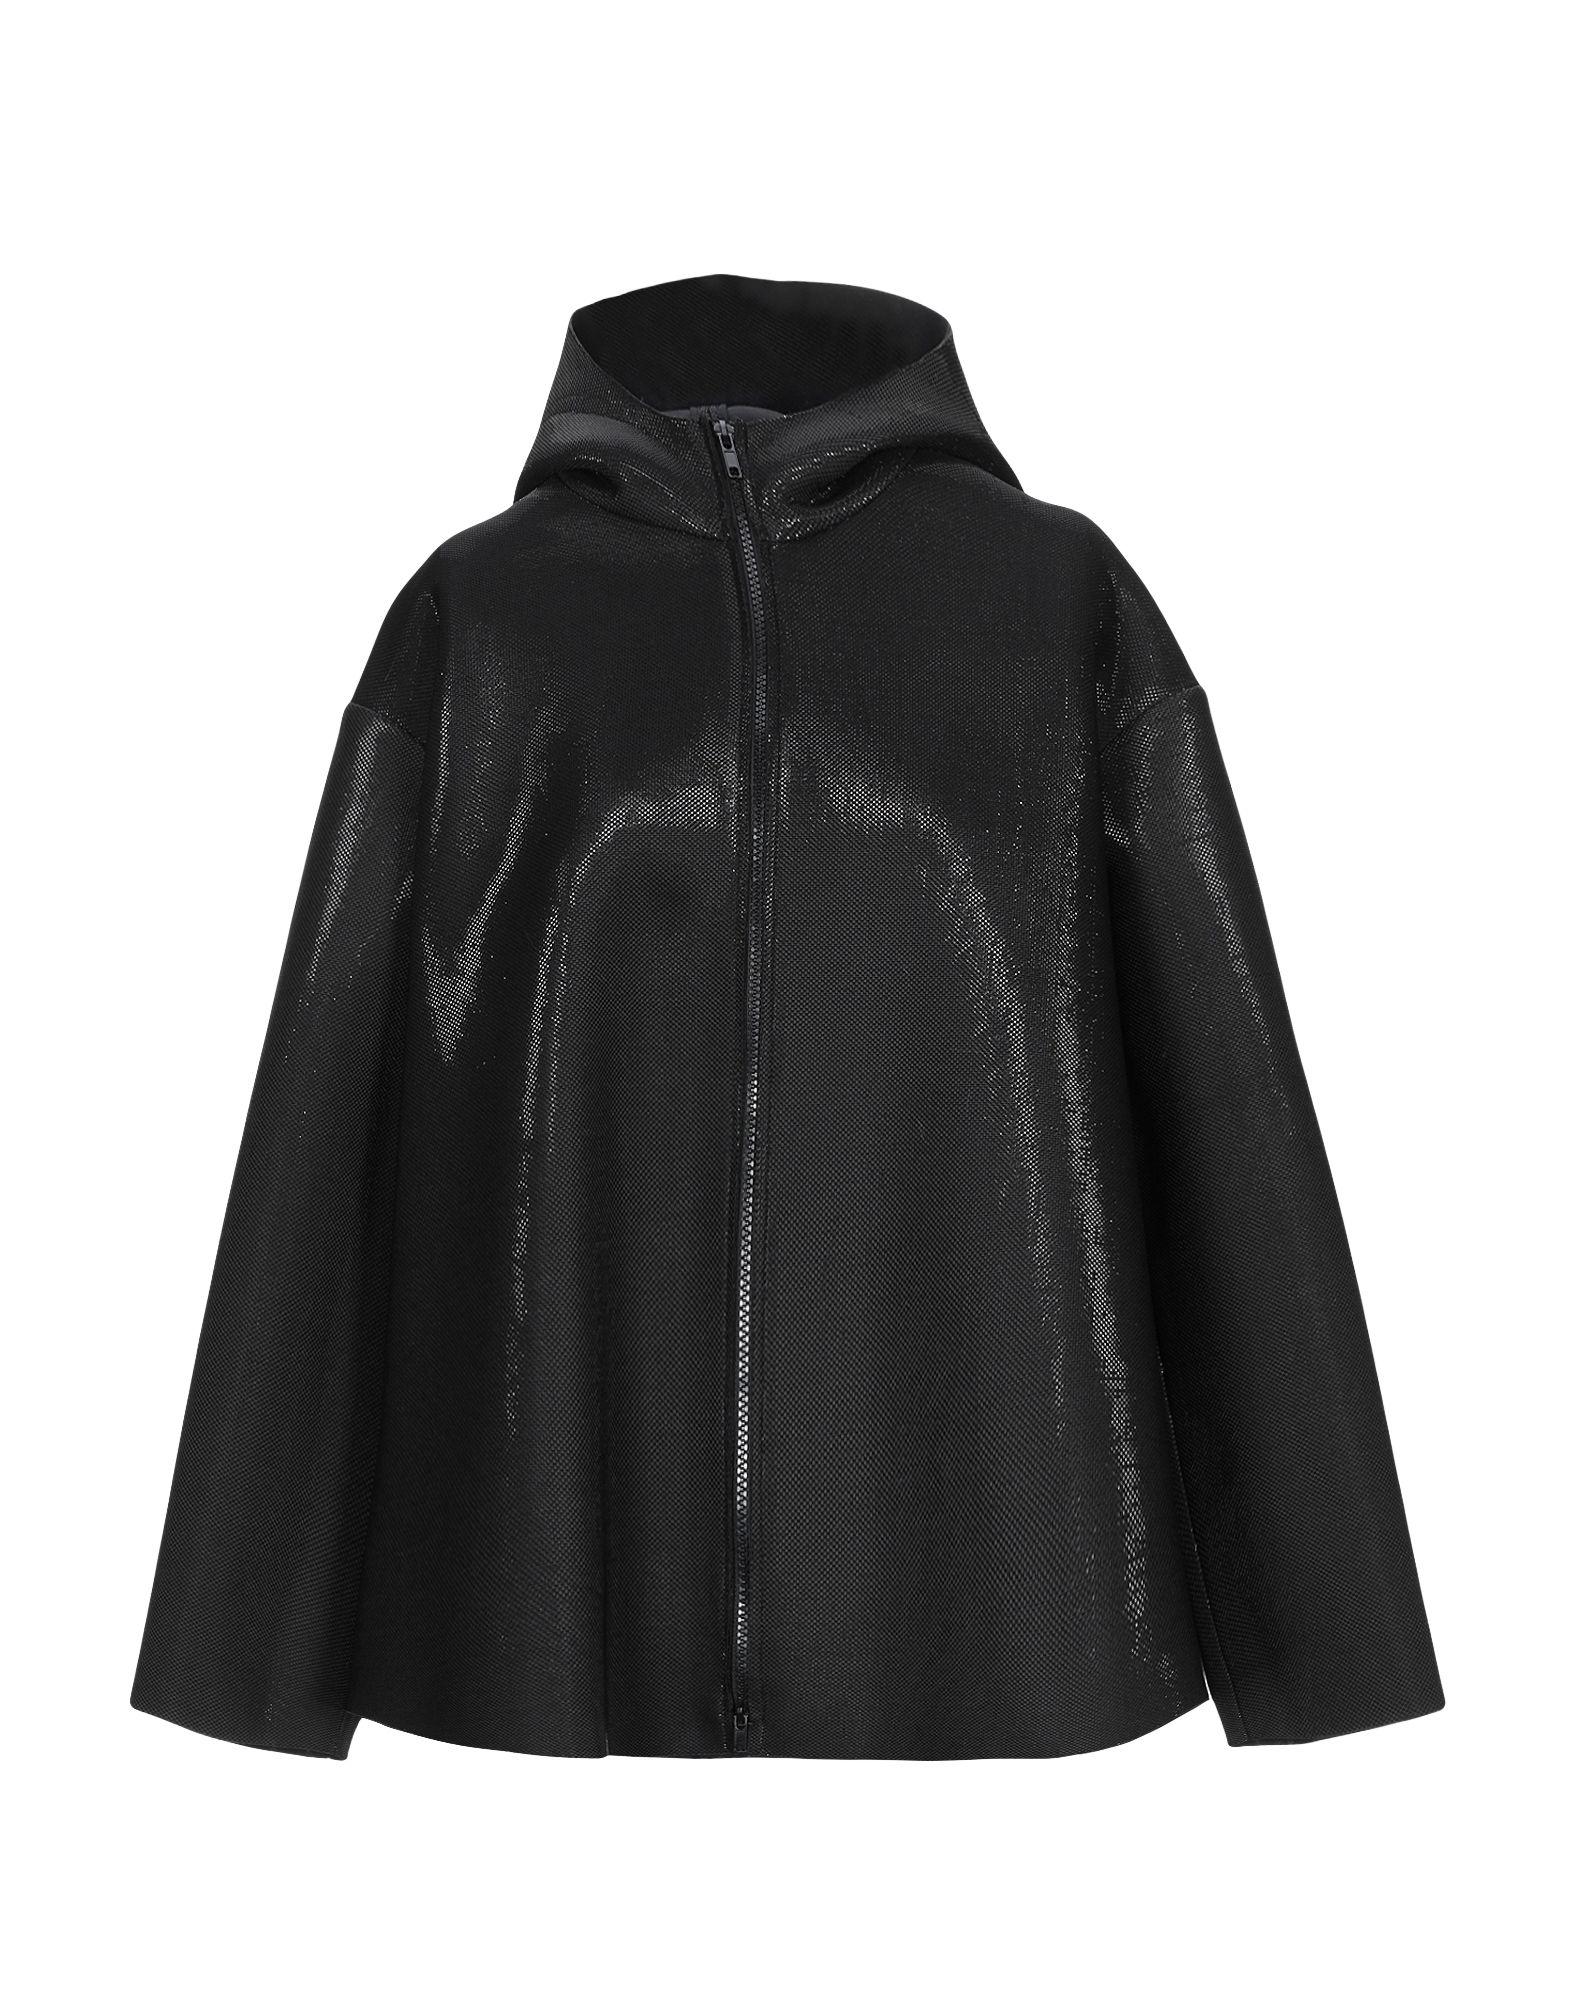 цена COMPAGNIA ITALIANA Куртка в интернет-магазинах